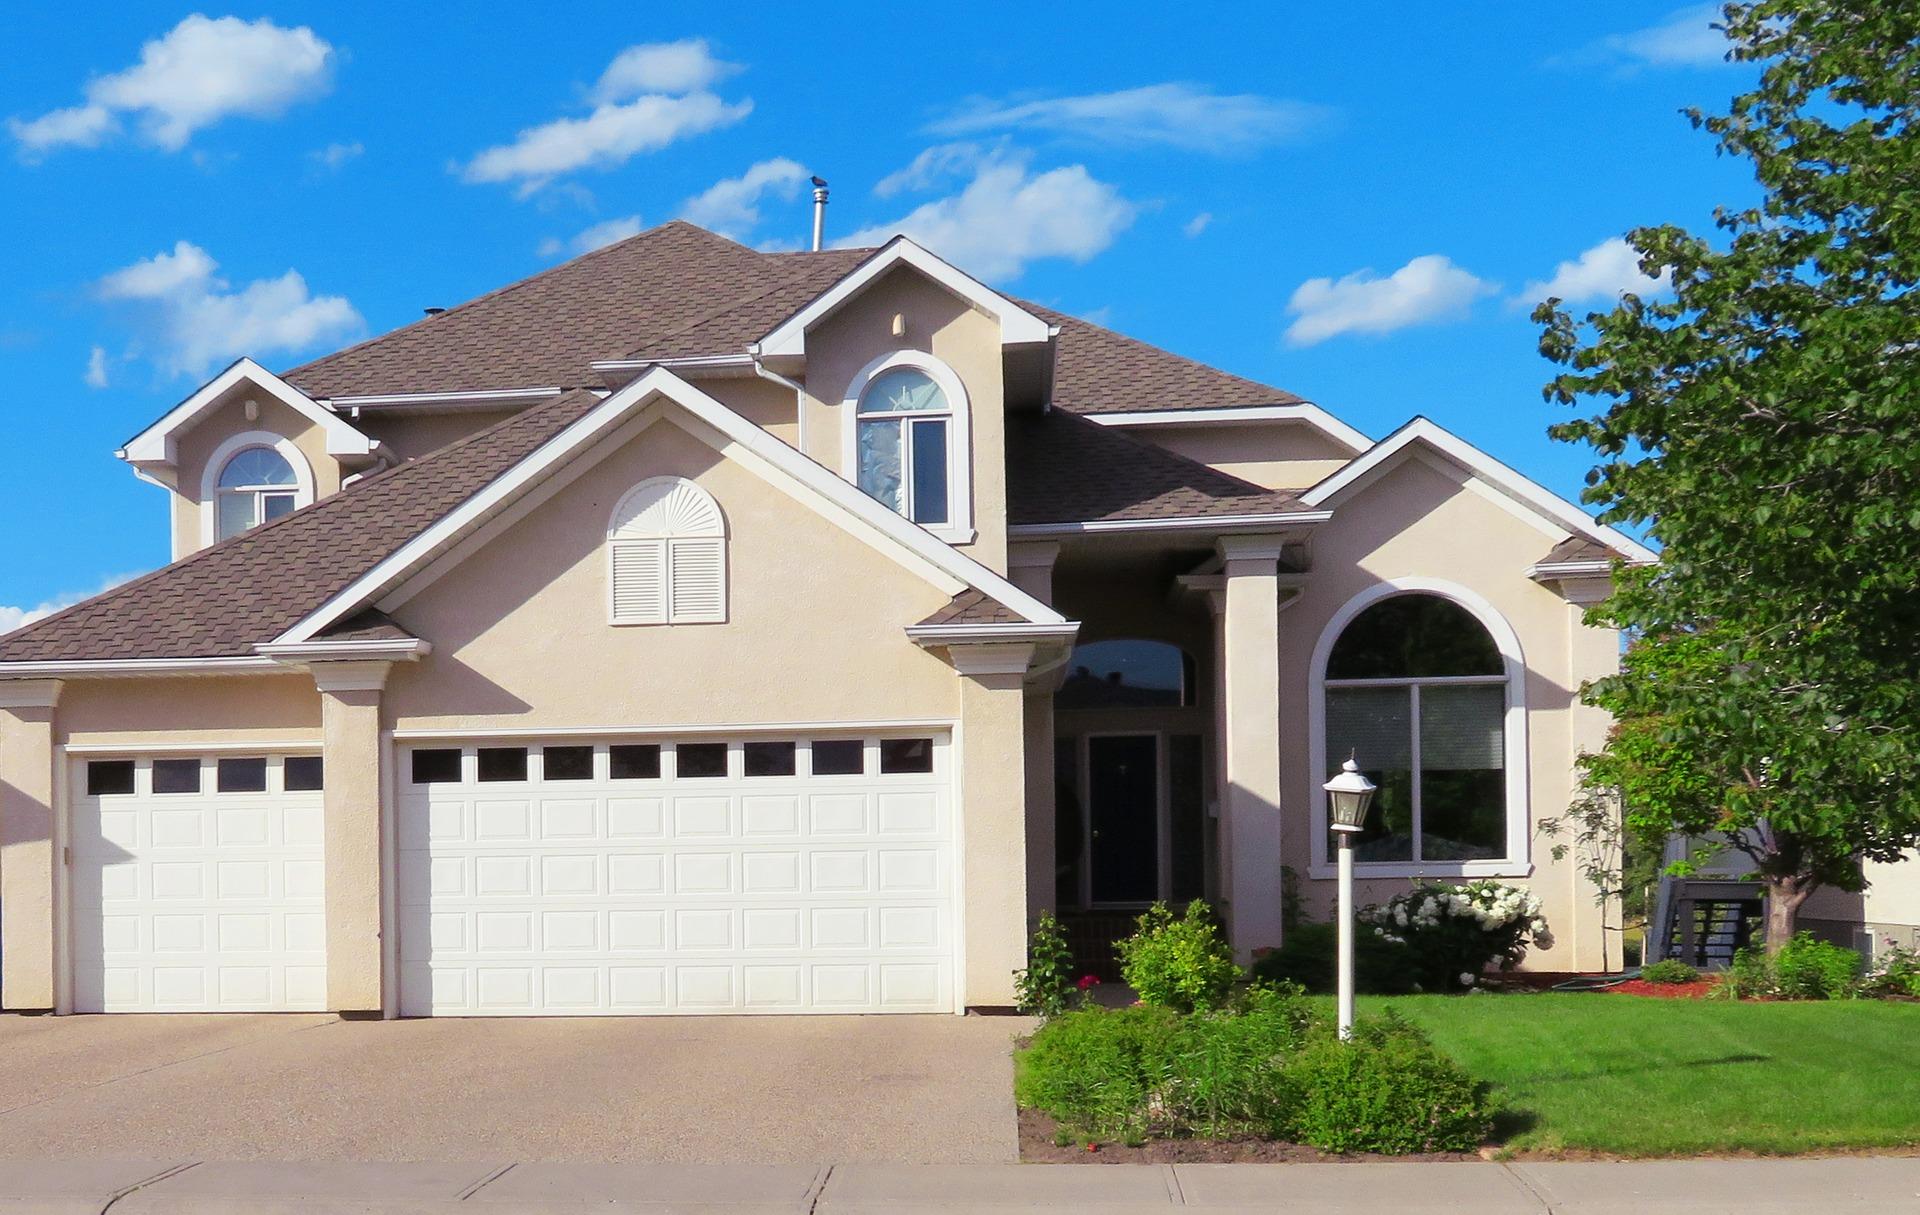 house-2418106_1920